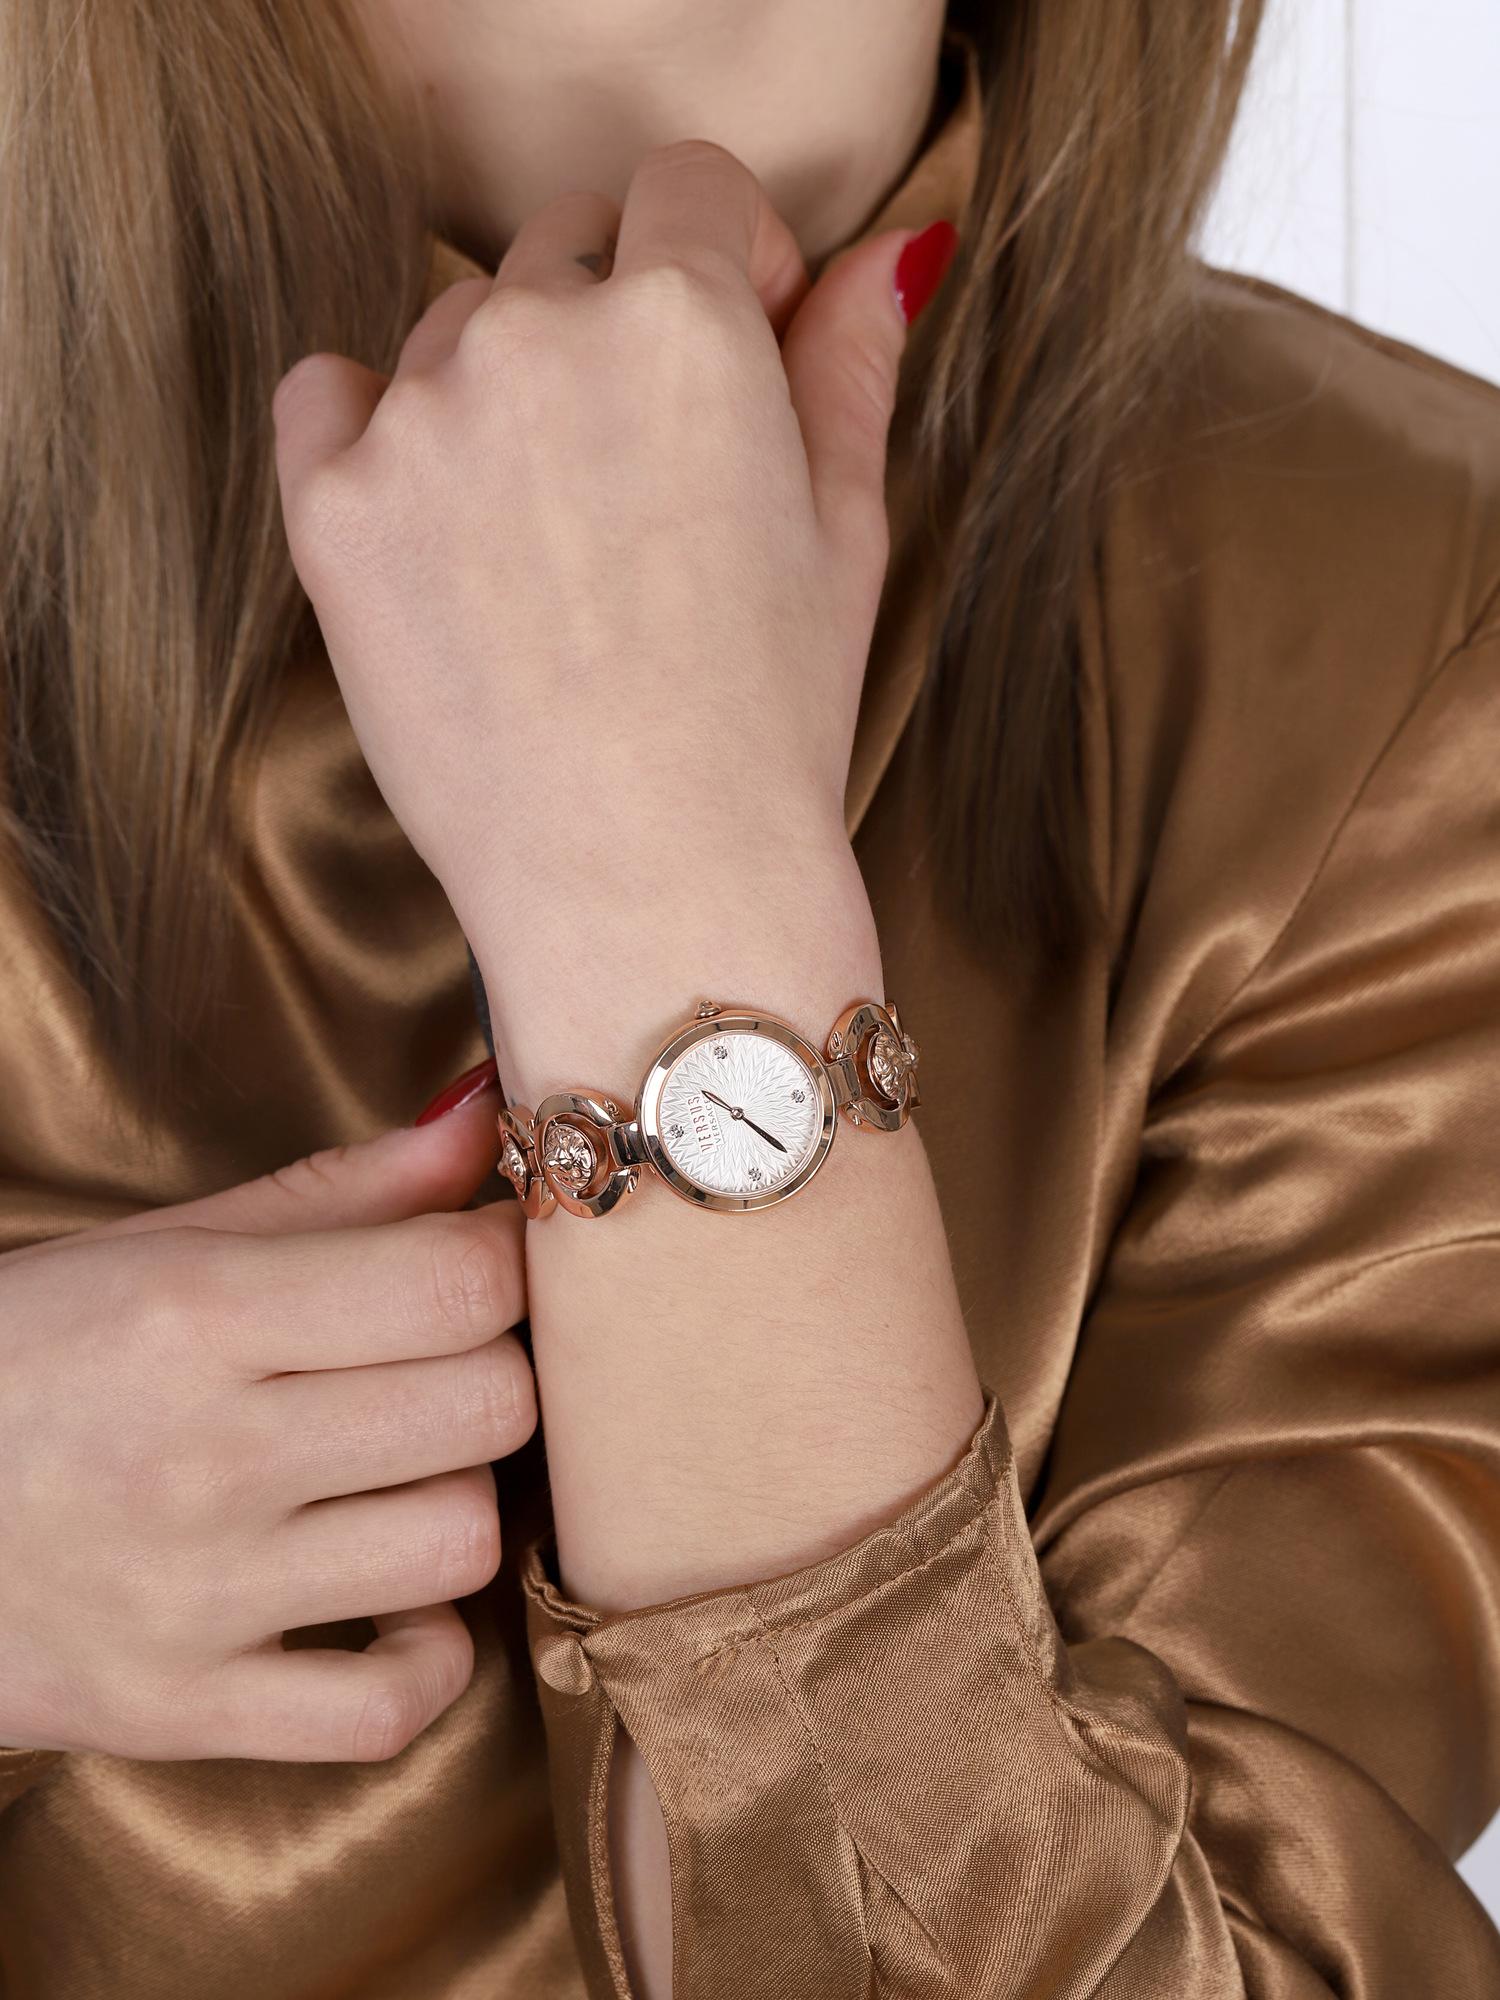 Versus Versace VSPHL0420 zegarek różowe złoto klasyczny Damskie bransoleta